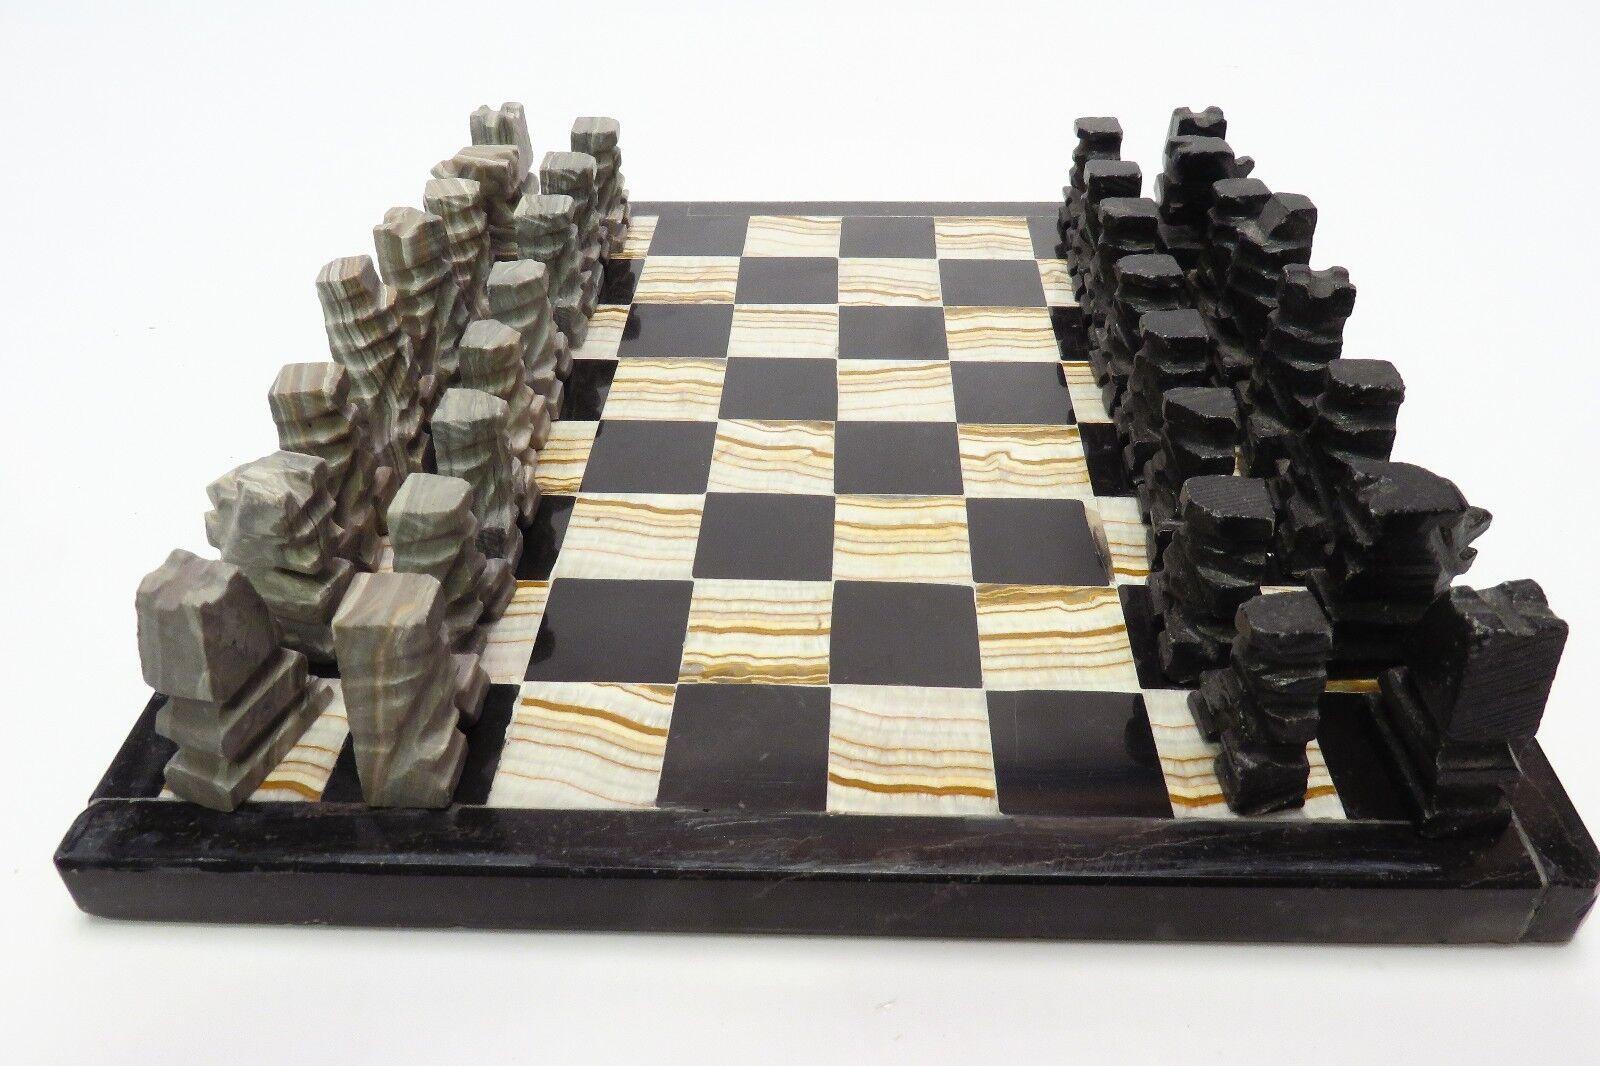 "SMALL Onyx Onyx Onyx Marble Stone Chess Set Aztec Artisan Hand Carved Board 7""x7"" BA4A68 b0d792"